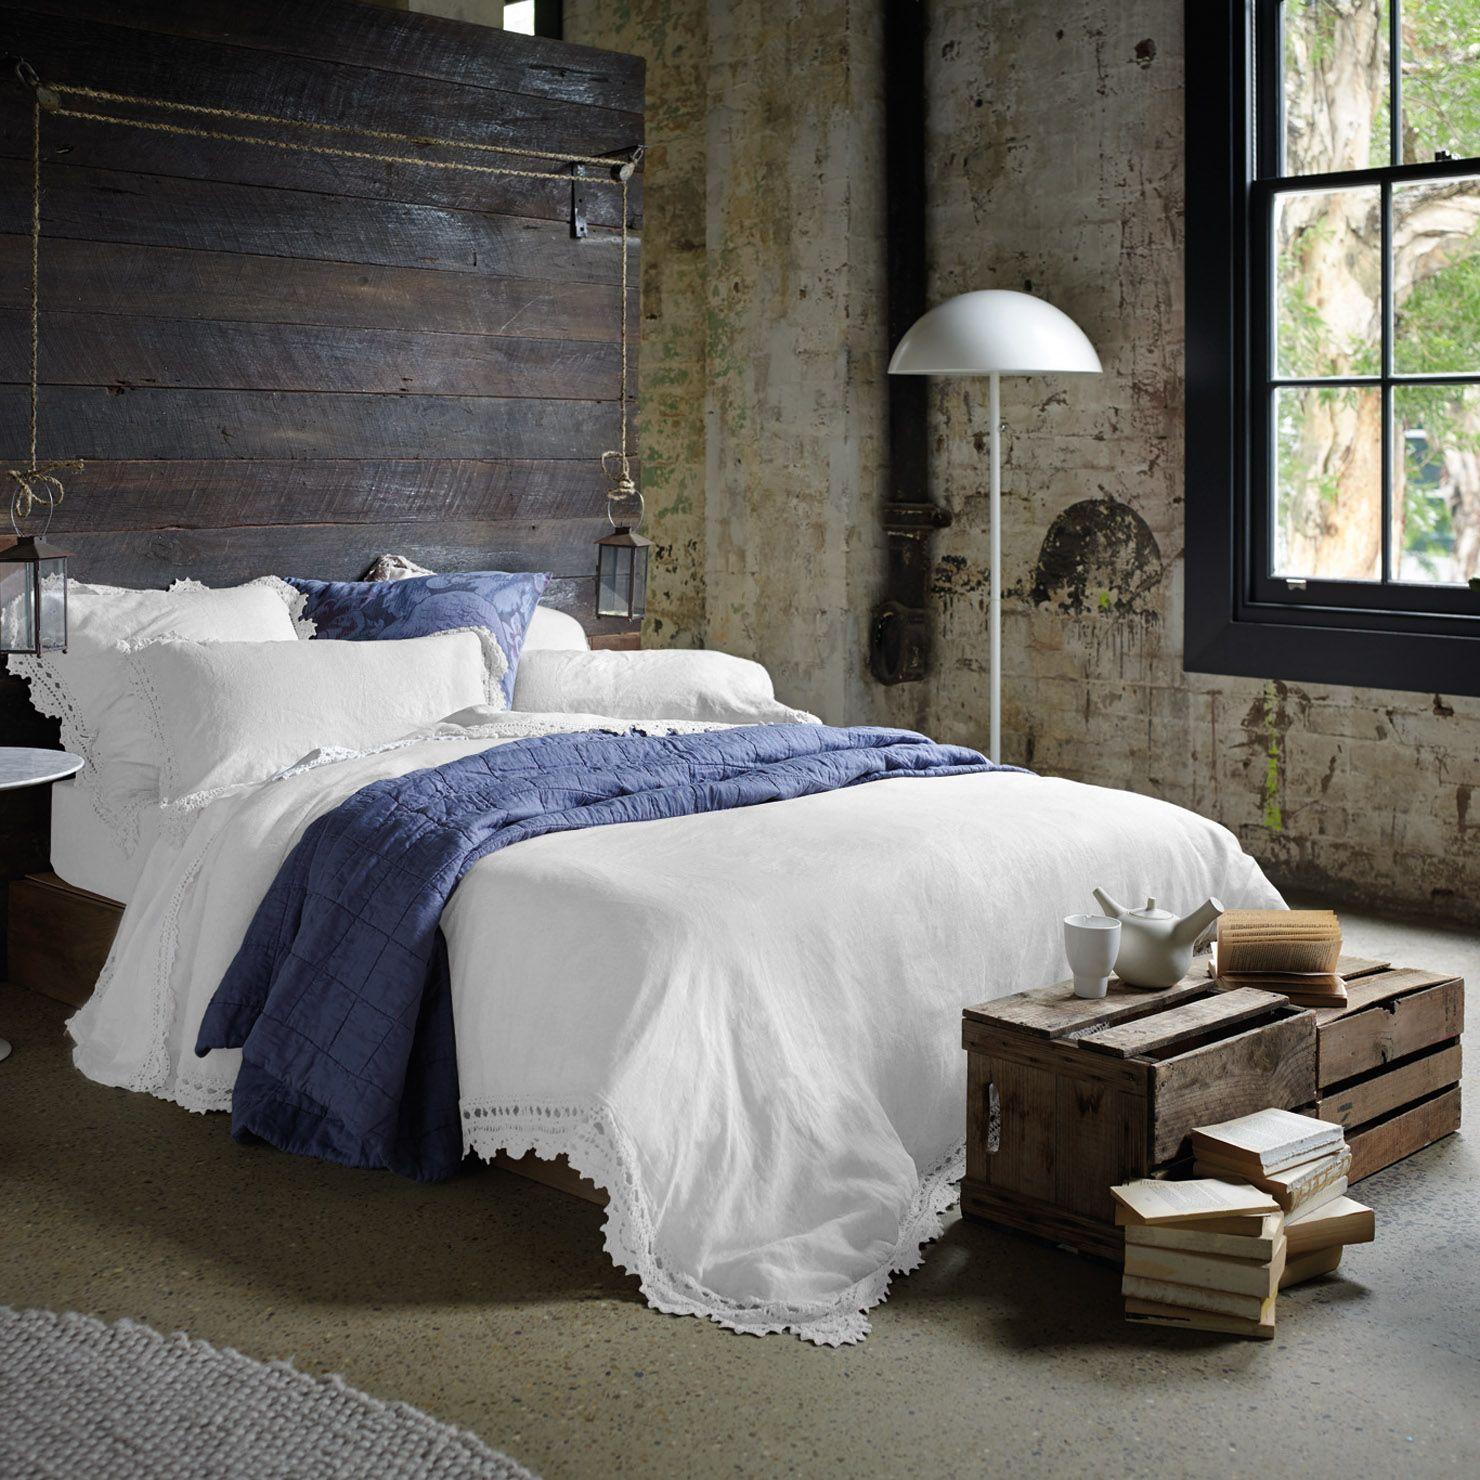 sheridan linge de lit Sheridan bed linen   every time I walk past and see the grey  sheridan linge de lit